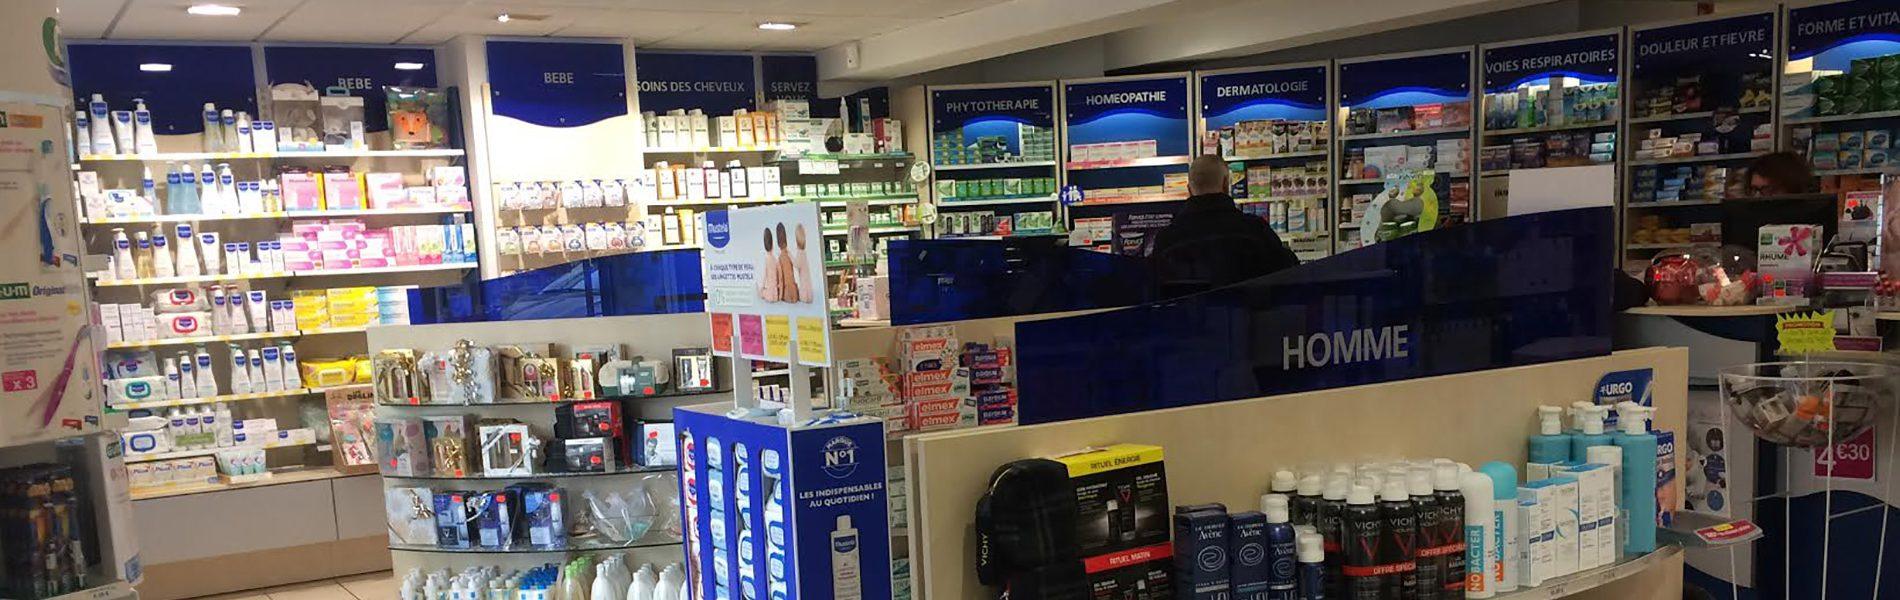 Pharmacie DEUMIER - Image Homepage 3